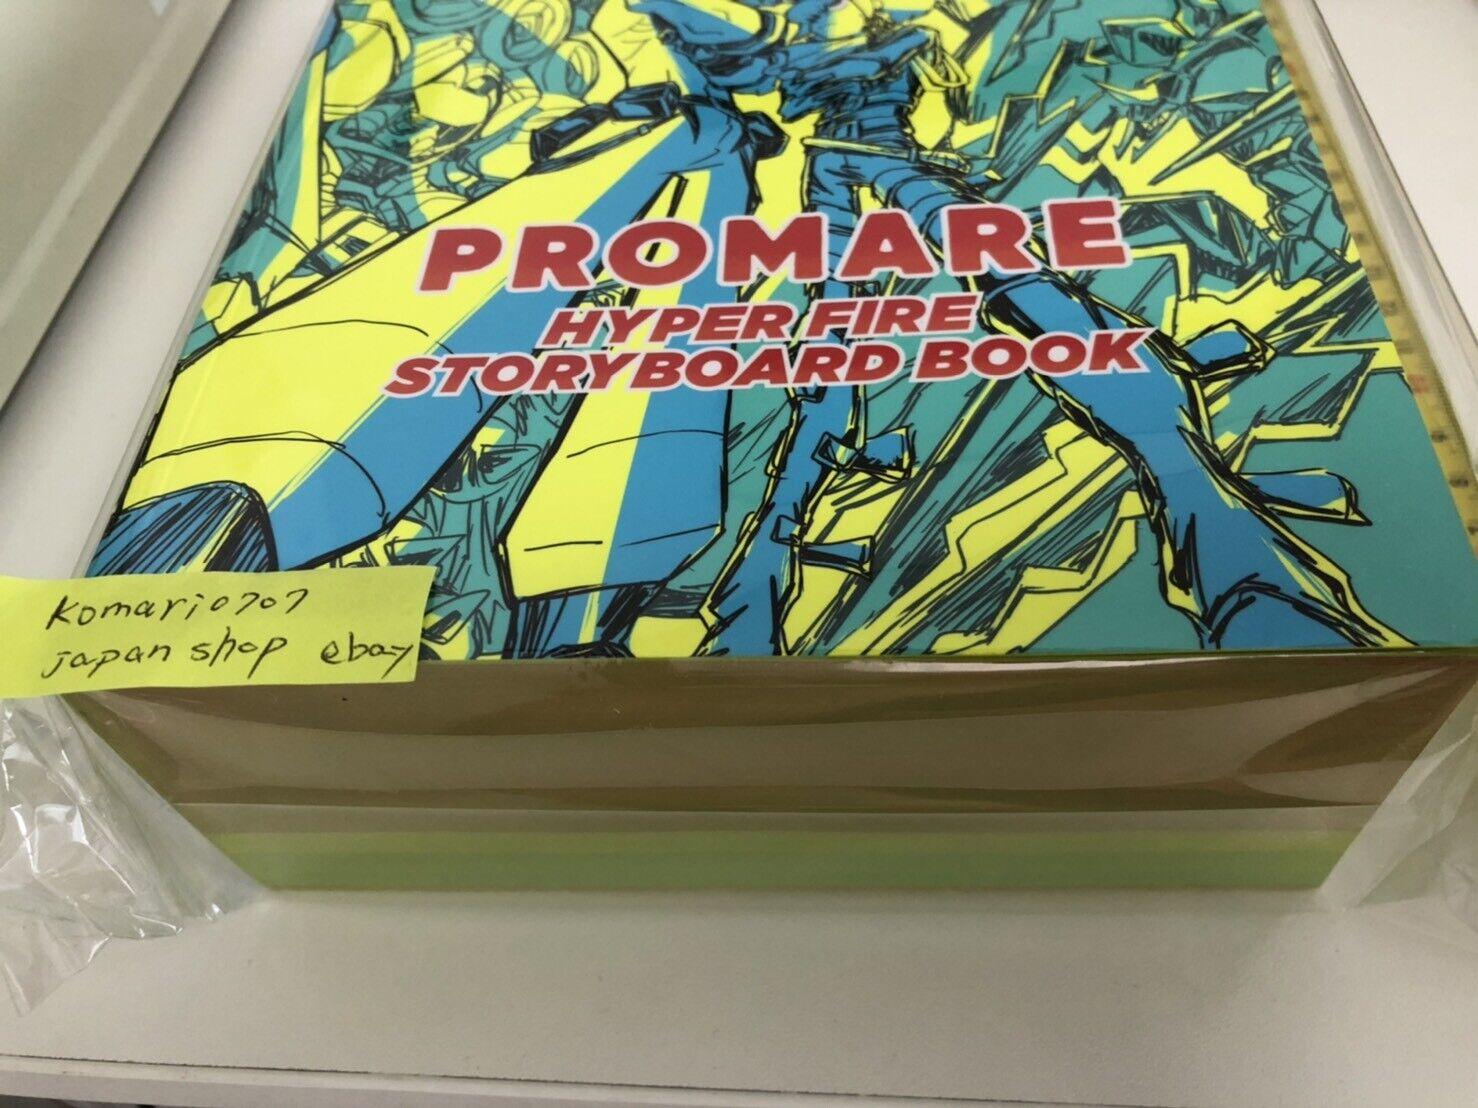 PROMARE HYPER FIRE STORYBOARD BOOK A5//1152p imaishi hiroyuki lio TRIGGER used